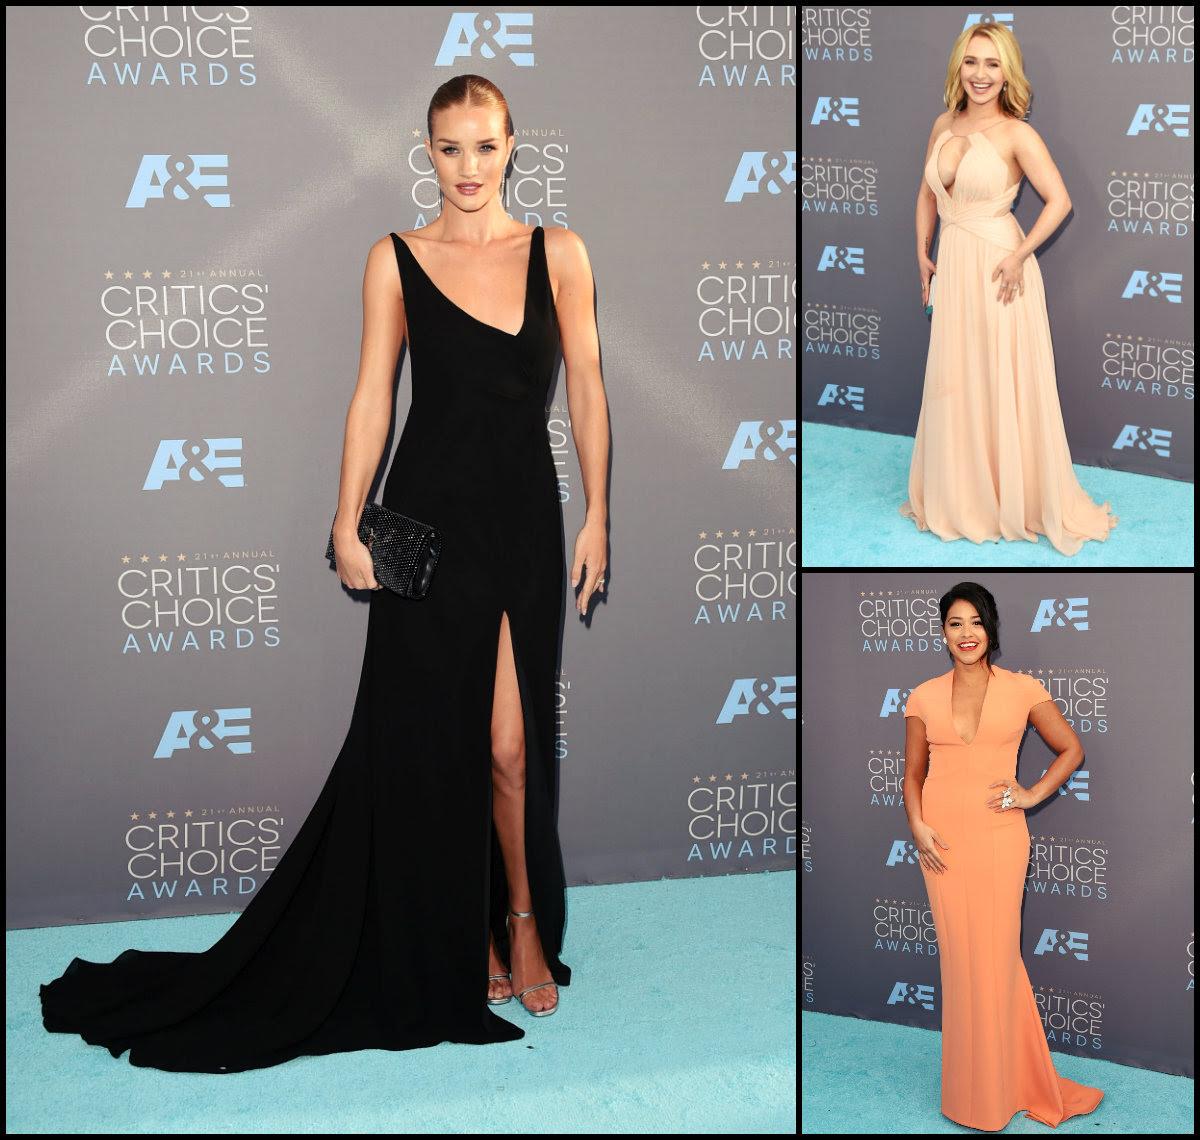 Critics Choice Awards 2016 Hairstyles Long Hairstyles